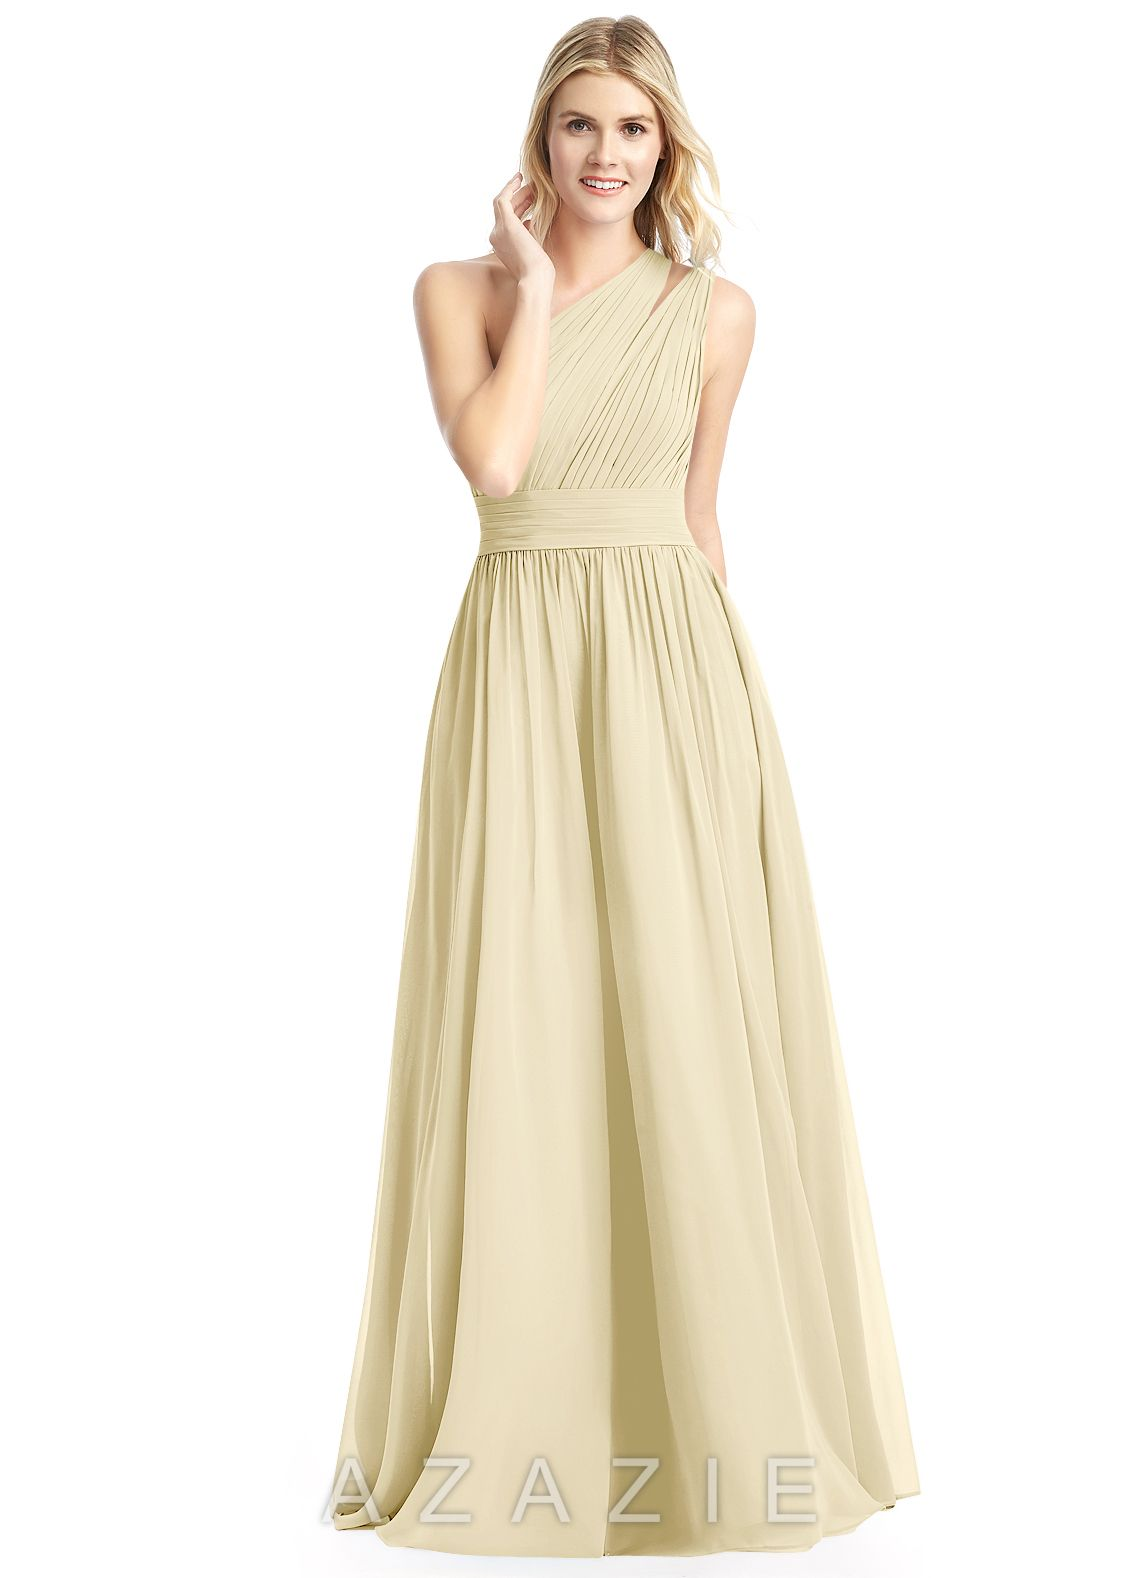 Molly bridesmaid dress favorite color bridal parties and weddings molly bridesmaid dress ombrellifo Images